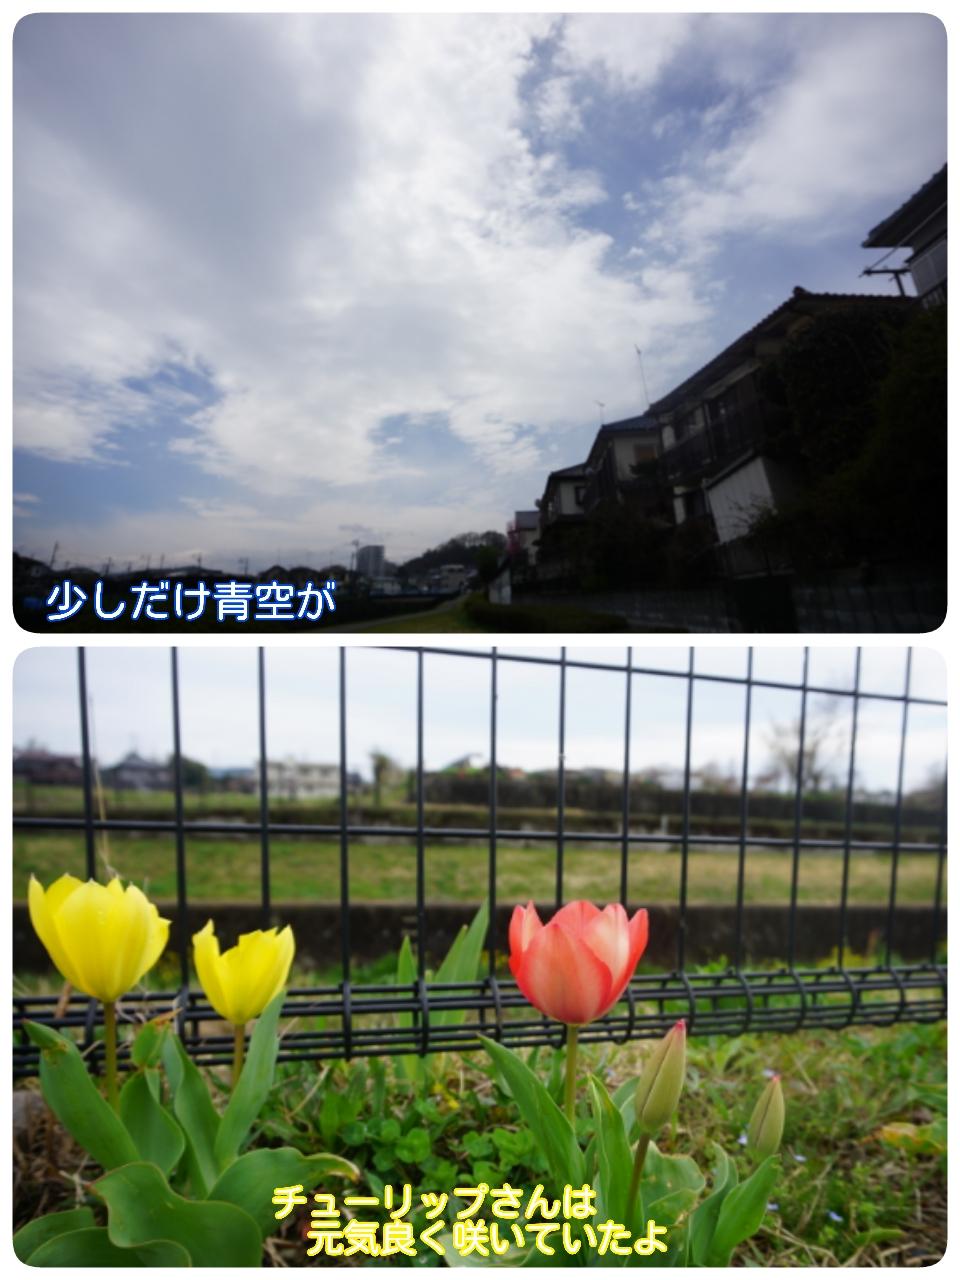 16-04-04-15-37-08-685_deco.jpg